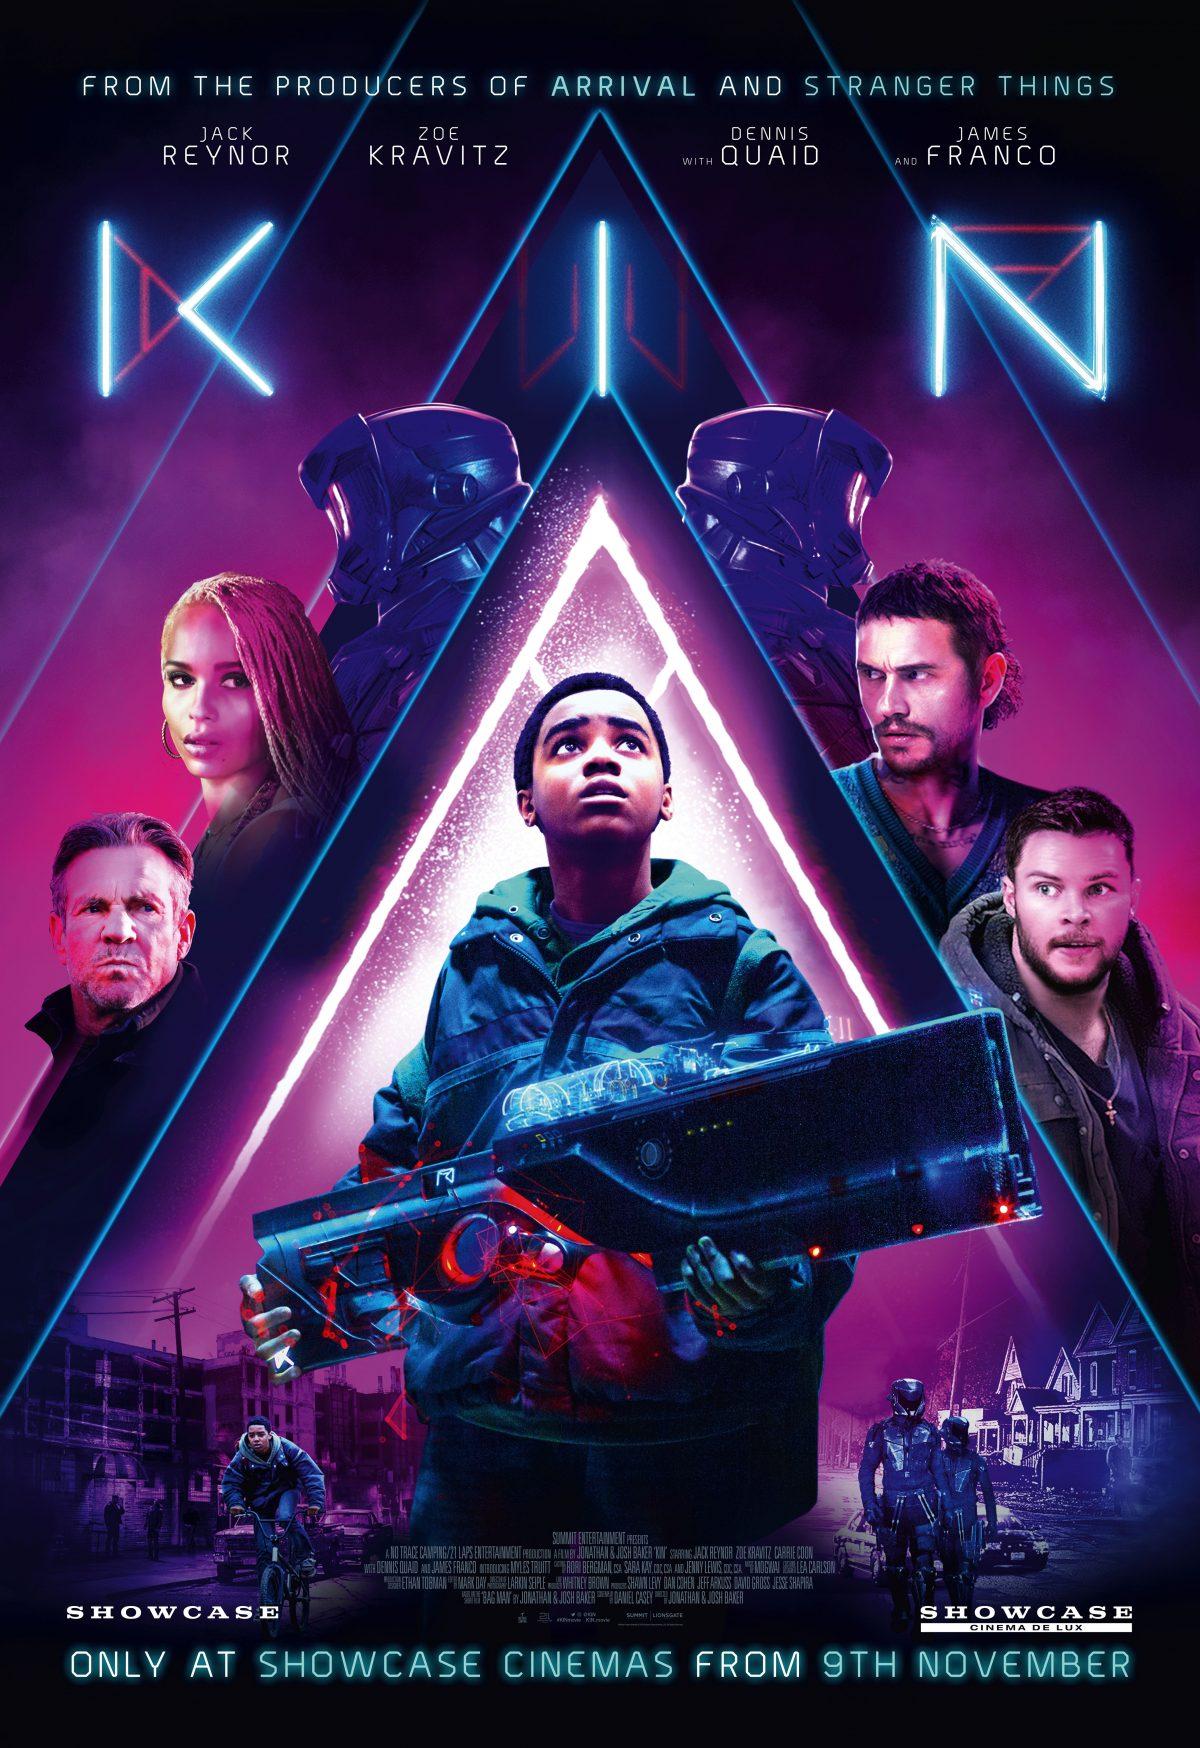 Film Review 'Kin' from directors Jonathan Baker and Josh Baker